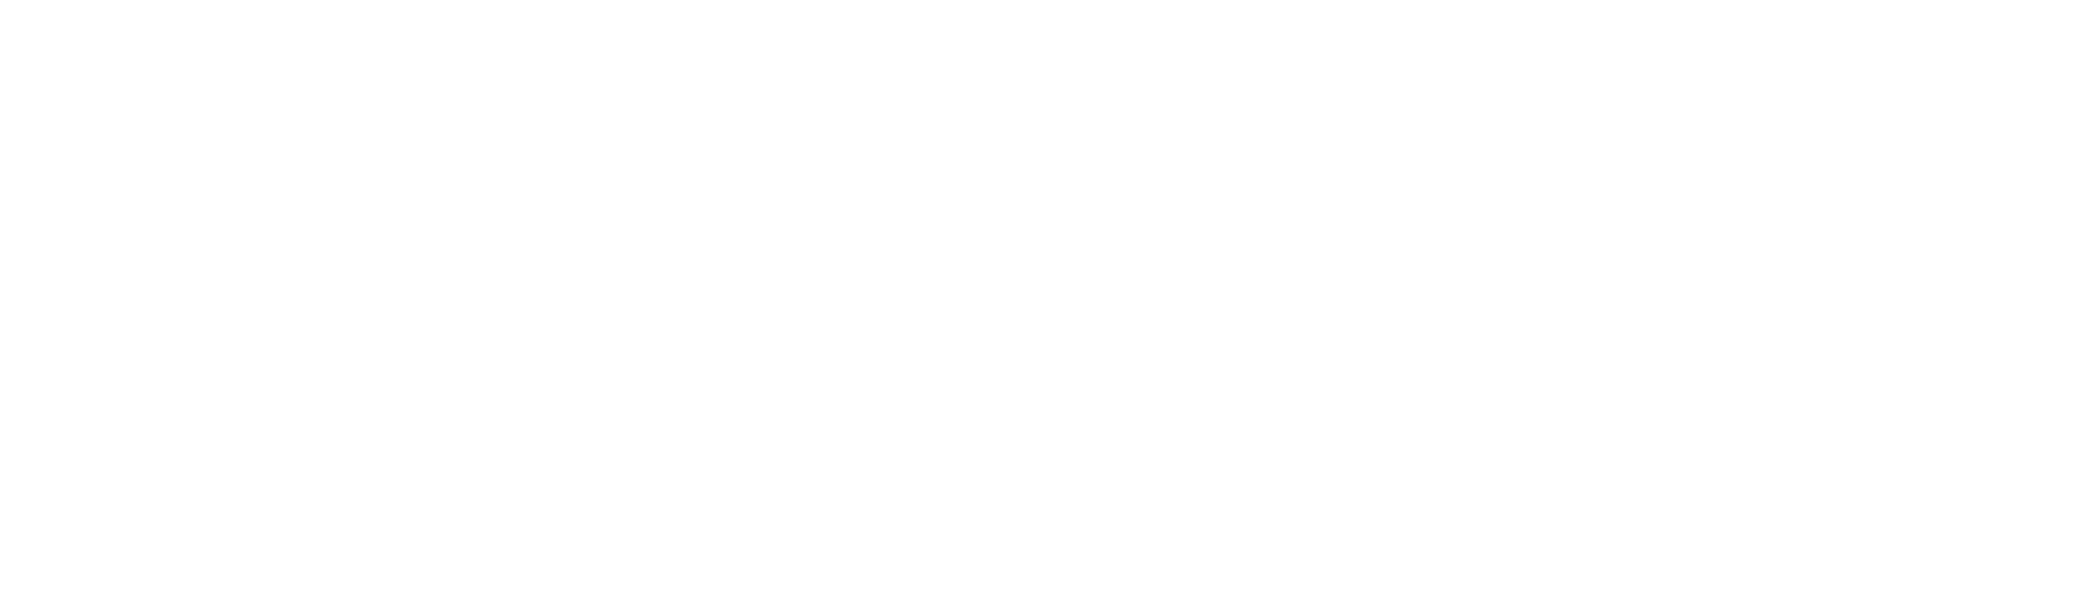 Risonanze Network